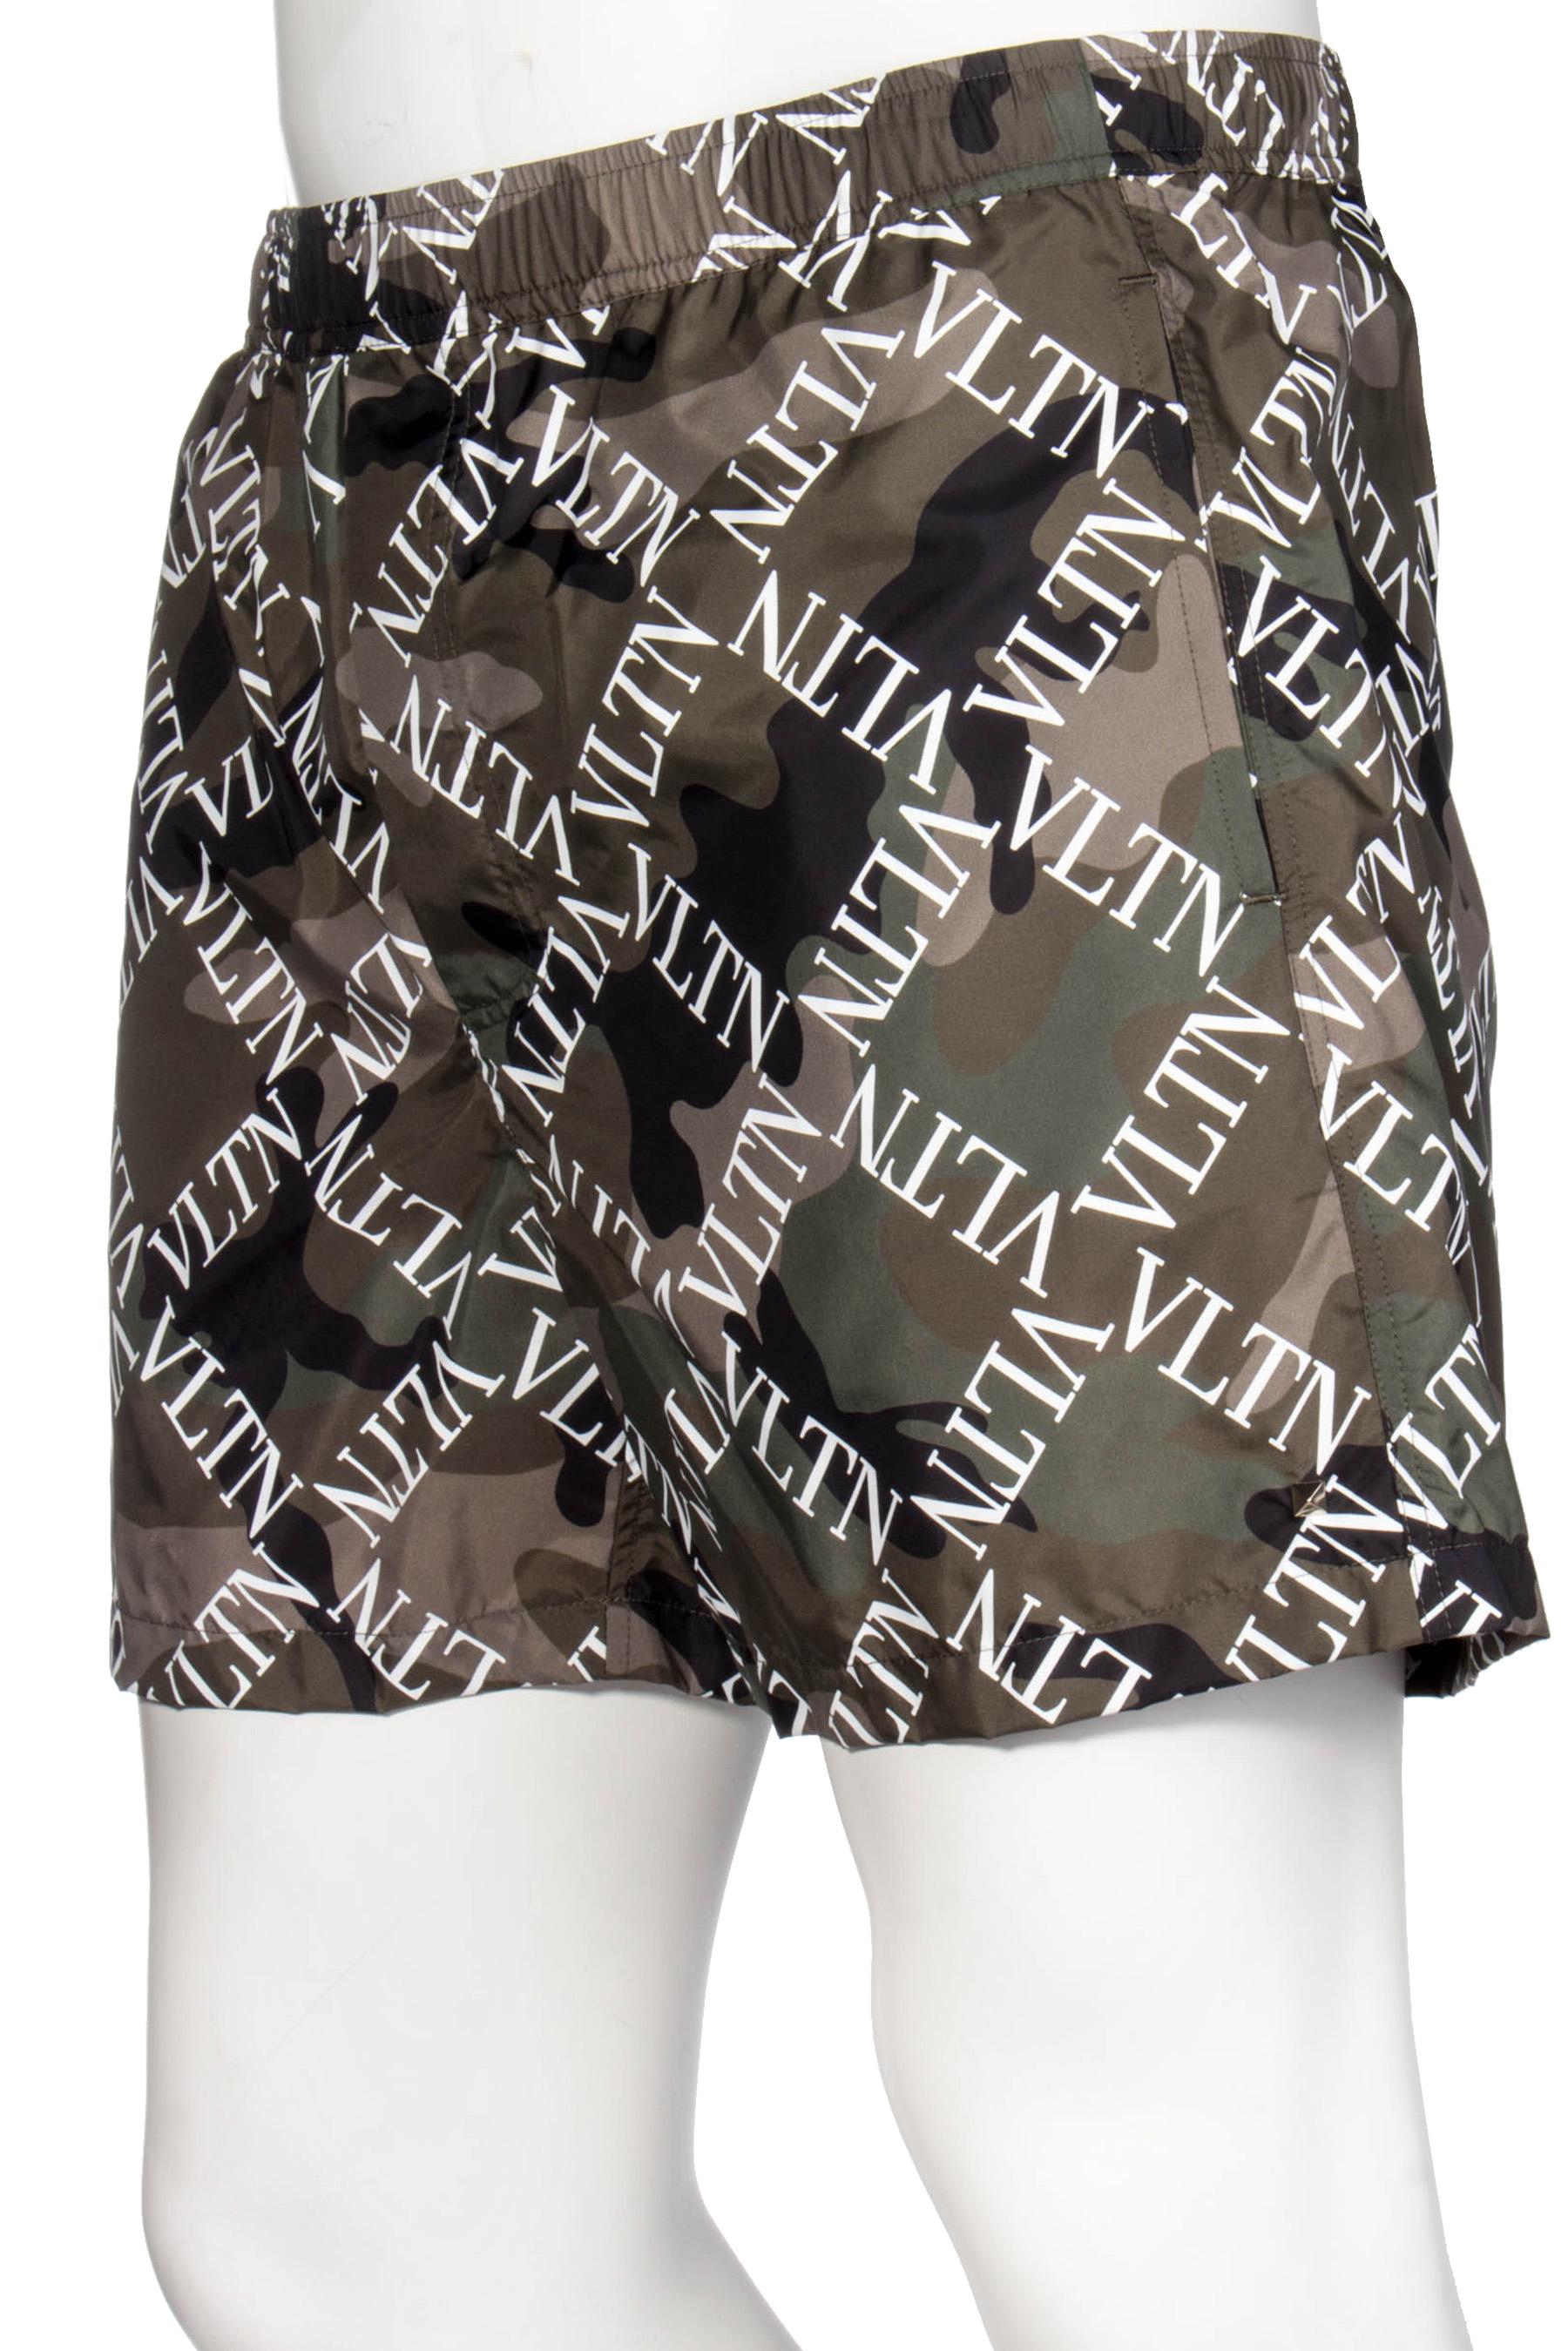 d1ebd0736b ... Preview: VALENTINO Camouflage Swim Shorts VLTN Grid Print ...